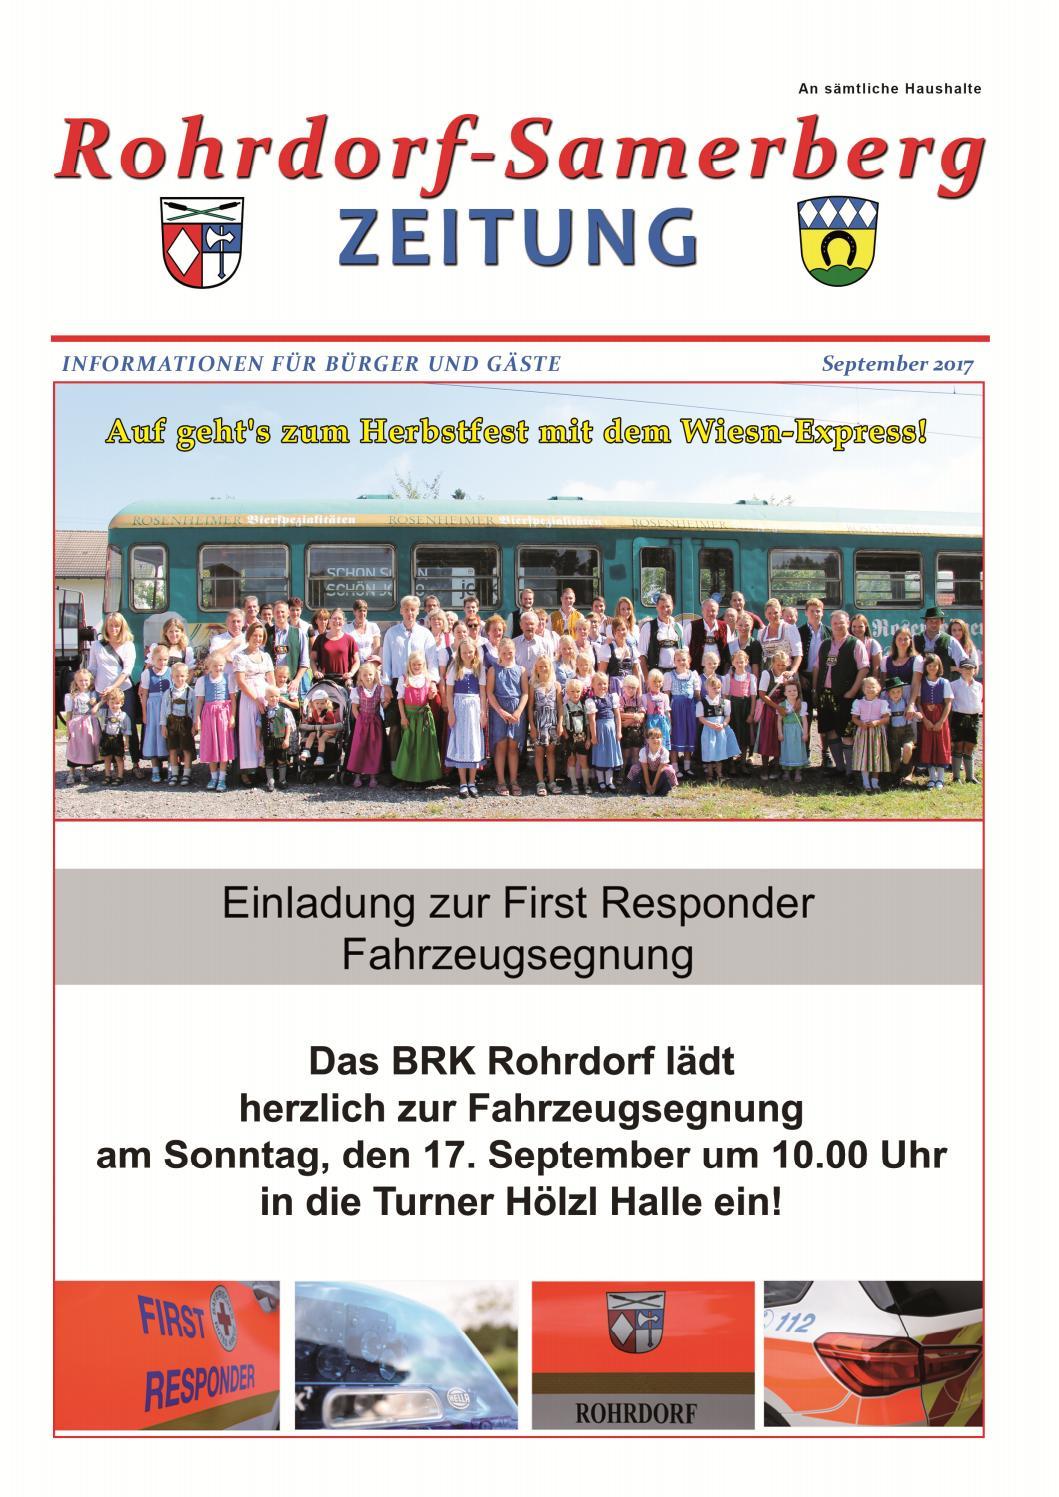 RSZ Rohrdorf-Samerberg ZEITUNG Ausgabe Septemberl 2017 by Uwe Hammerschmid  - issuu